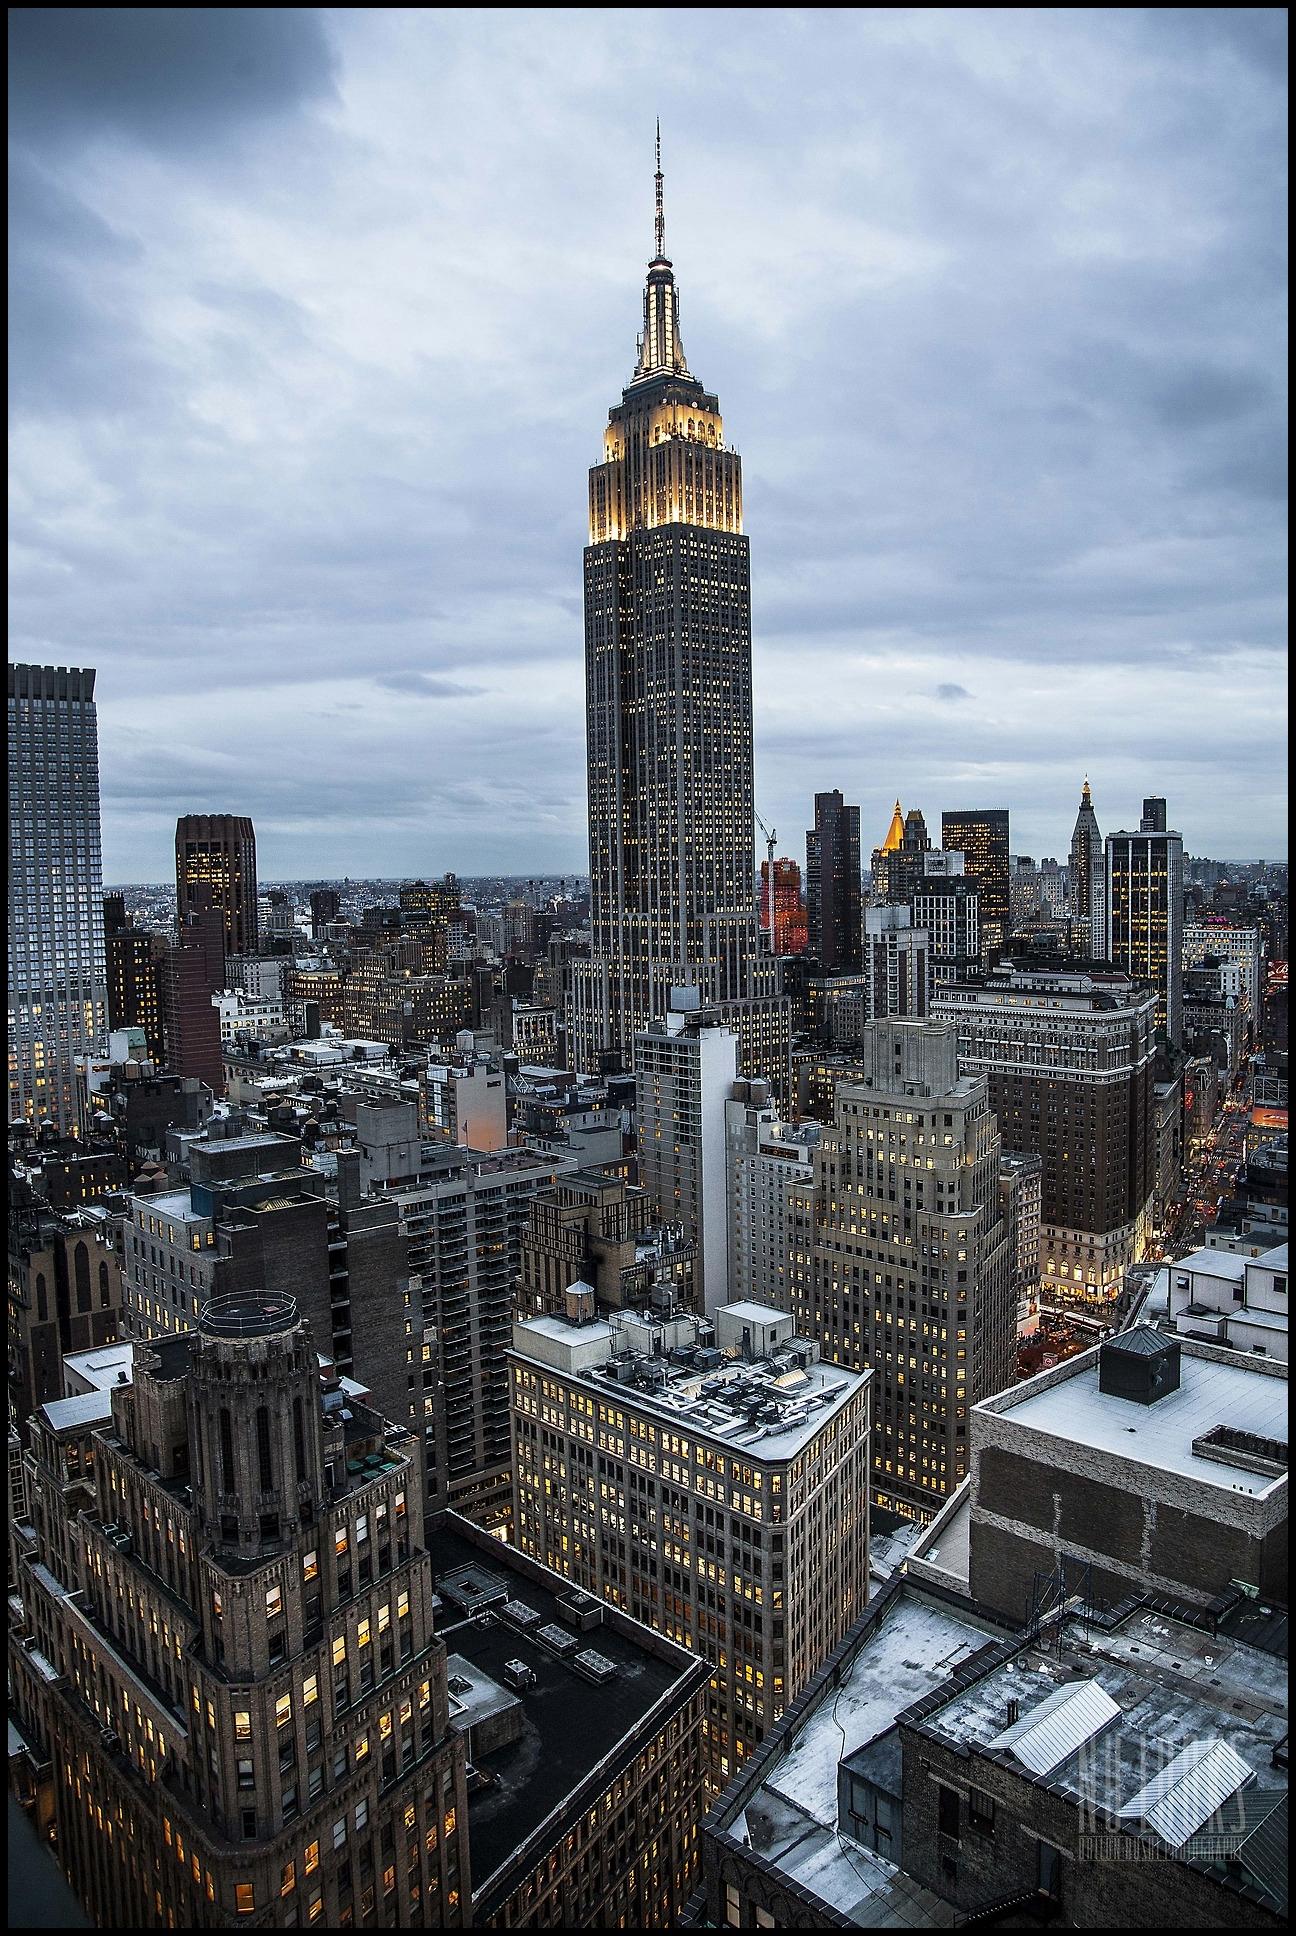 empire state building historias de nueva york. Black Bedroom Furniture Sets. Home Design Ideas